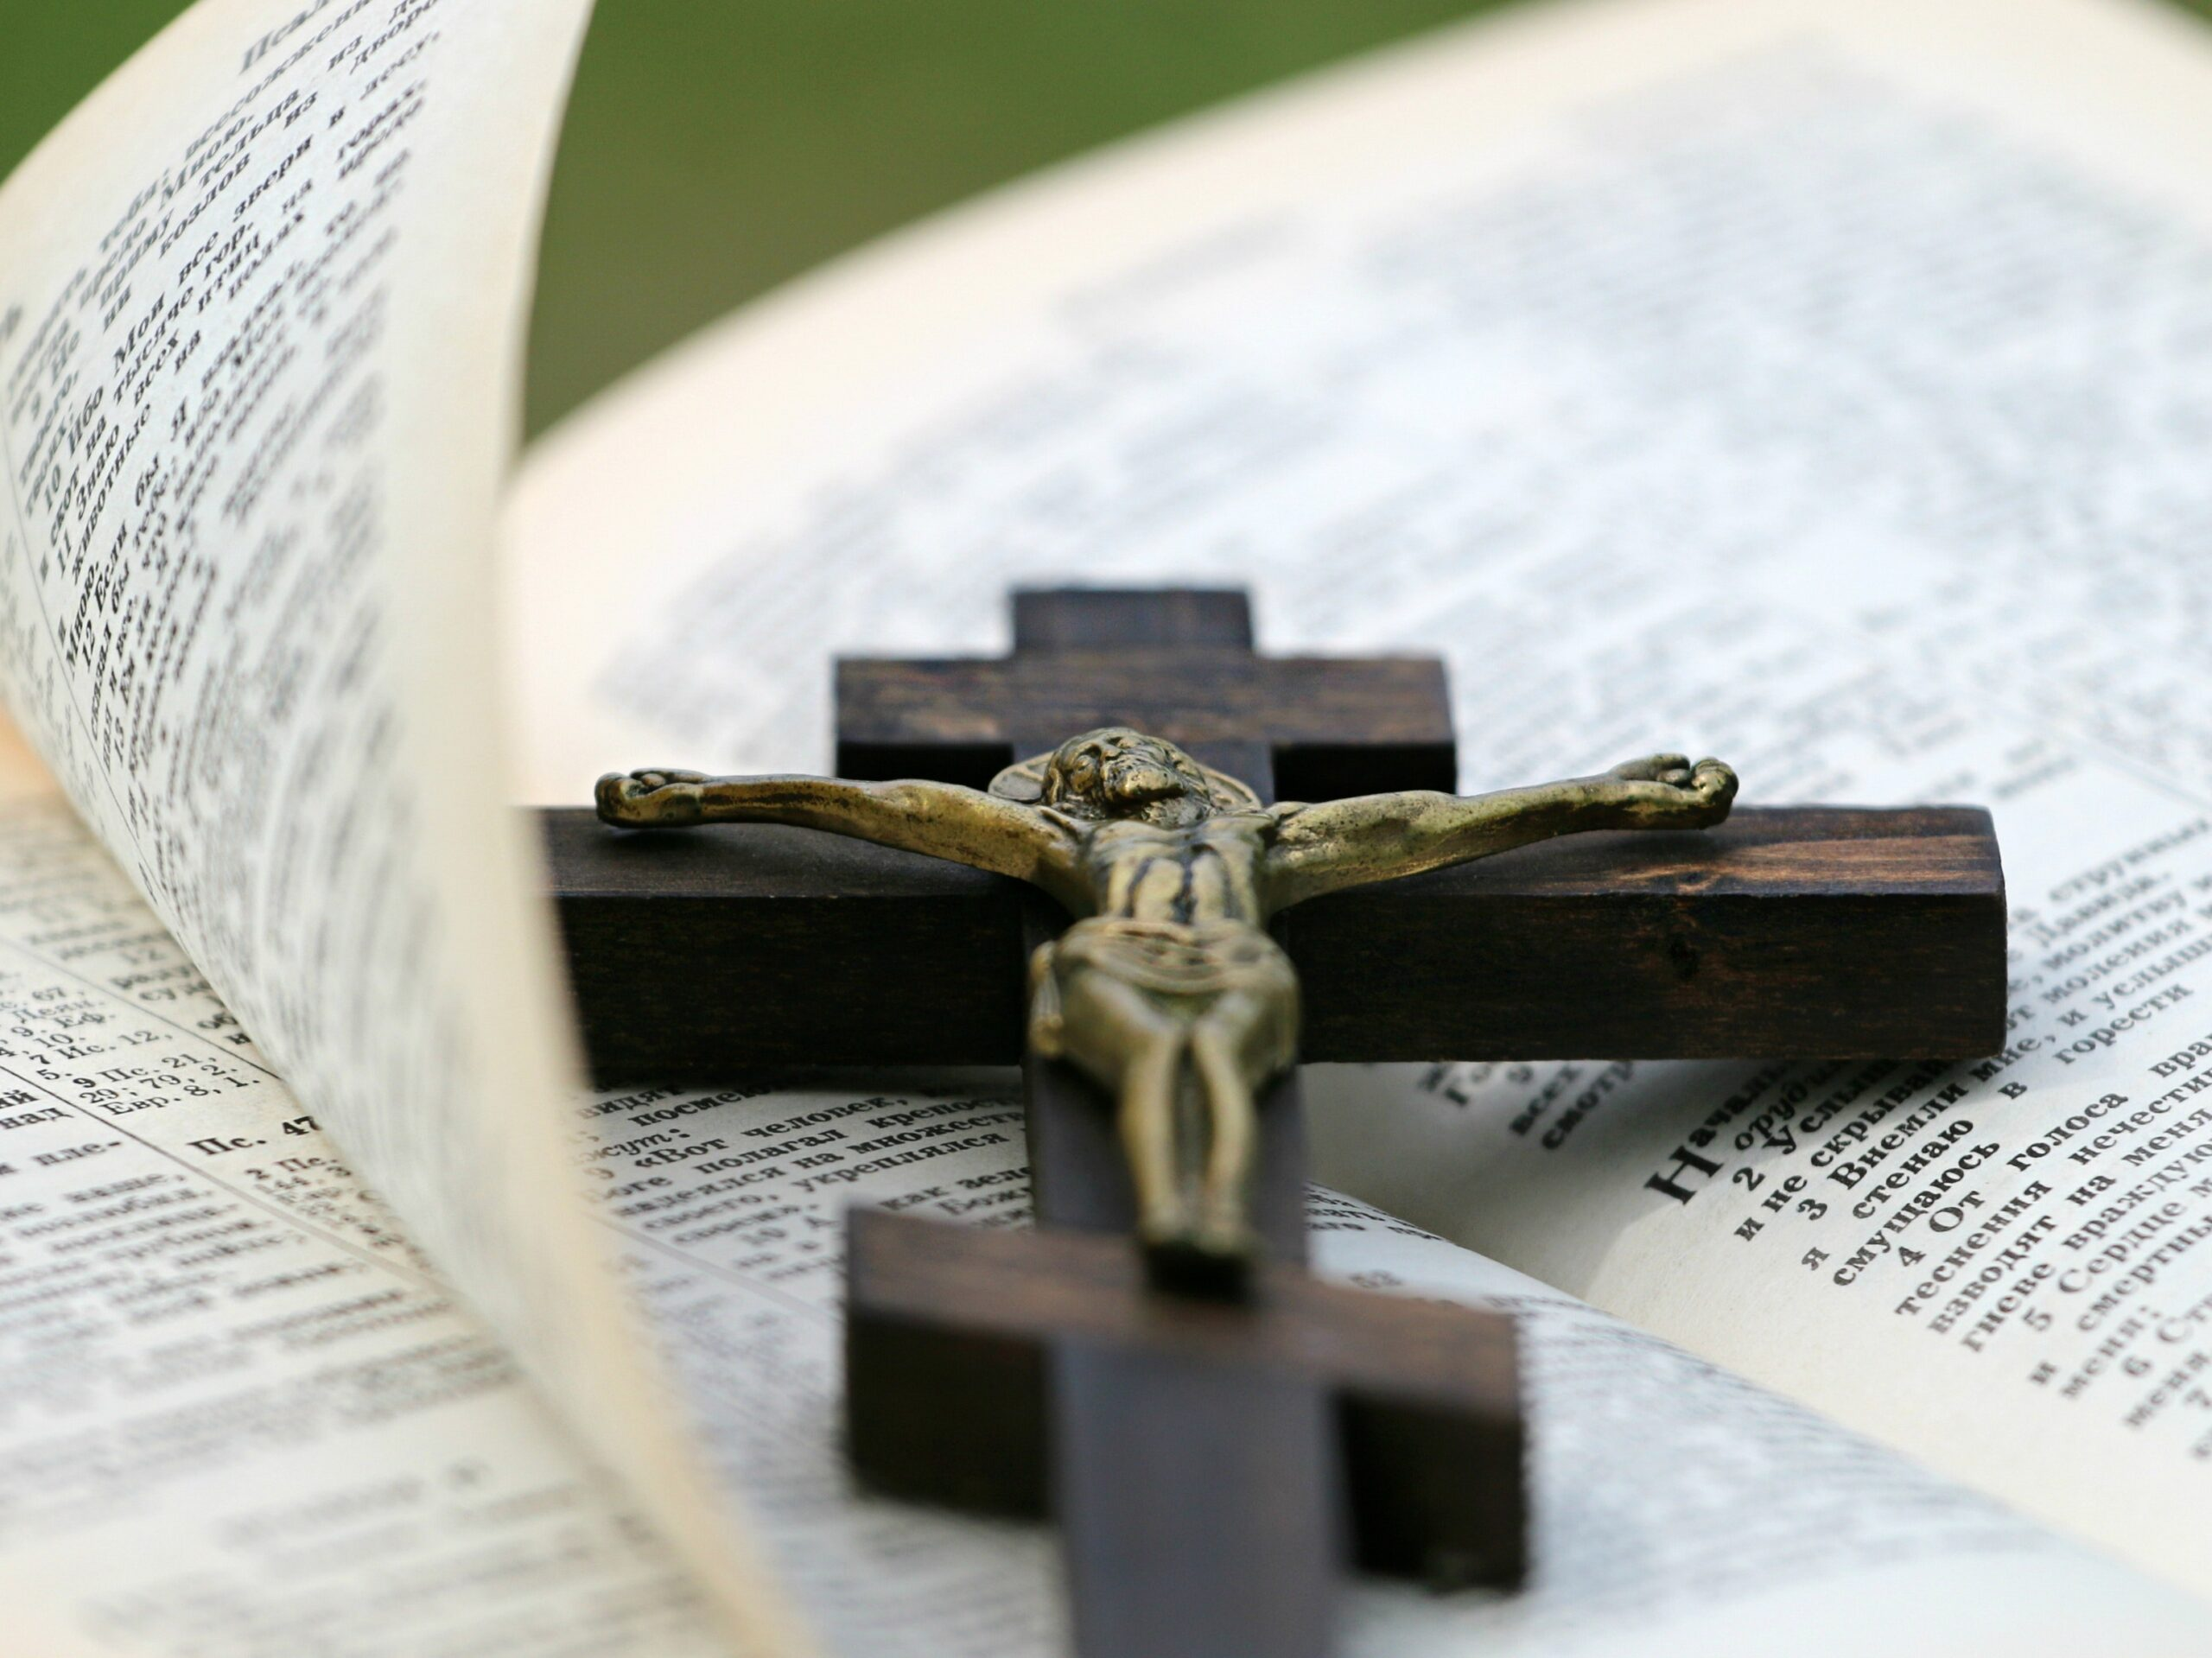 Becoming a Catholic